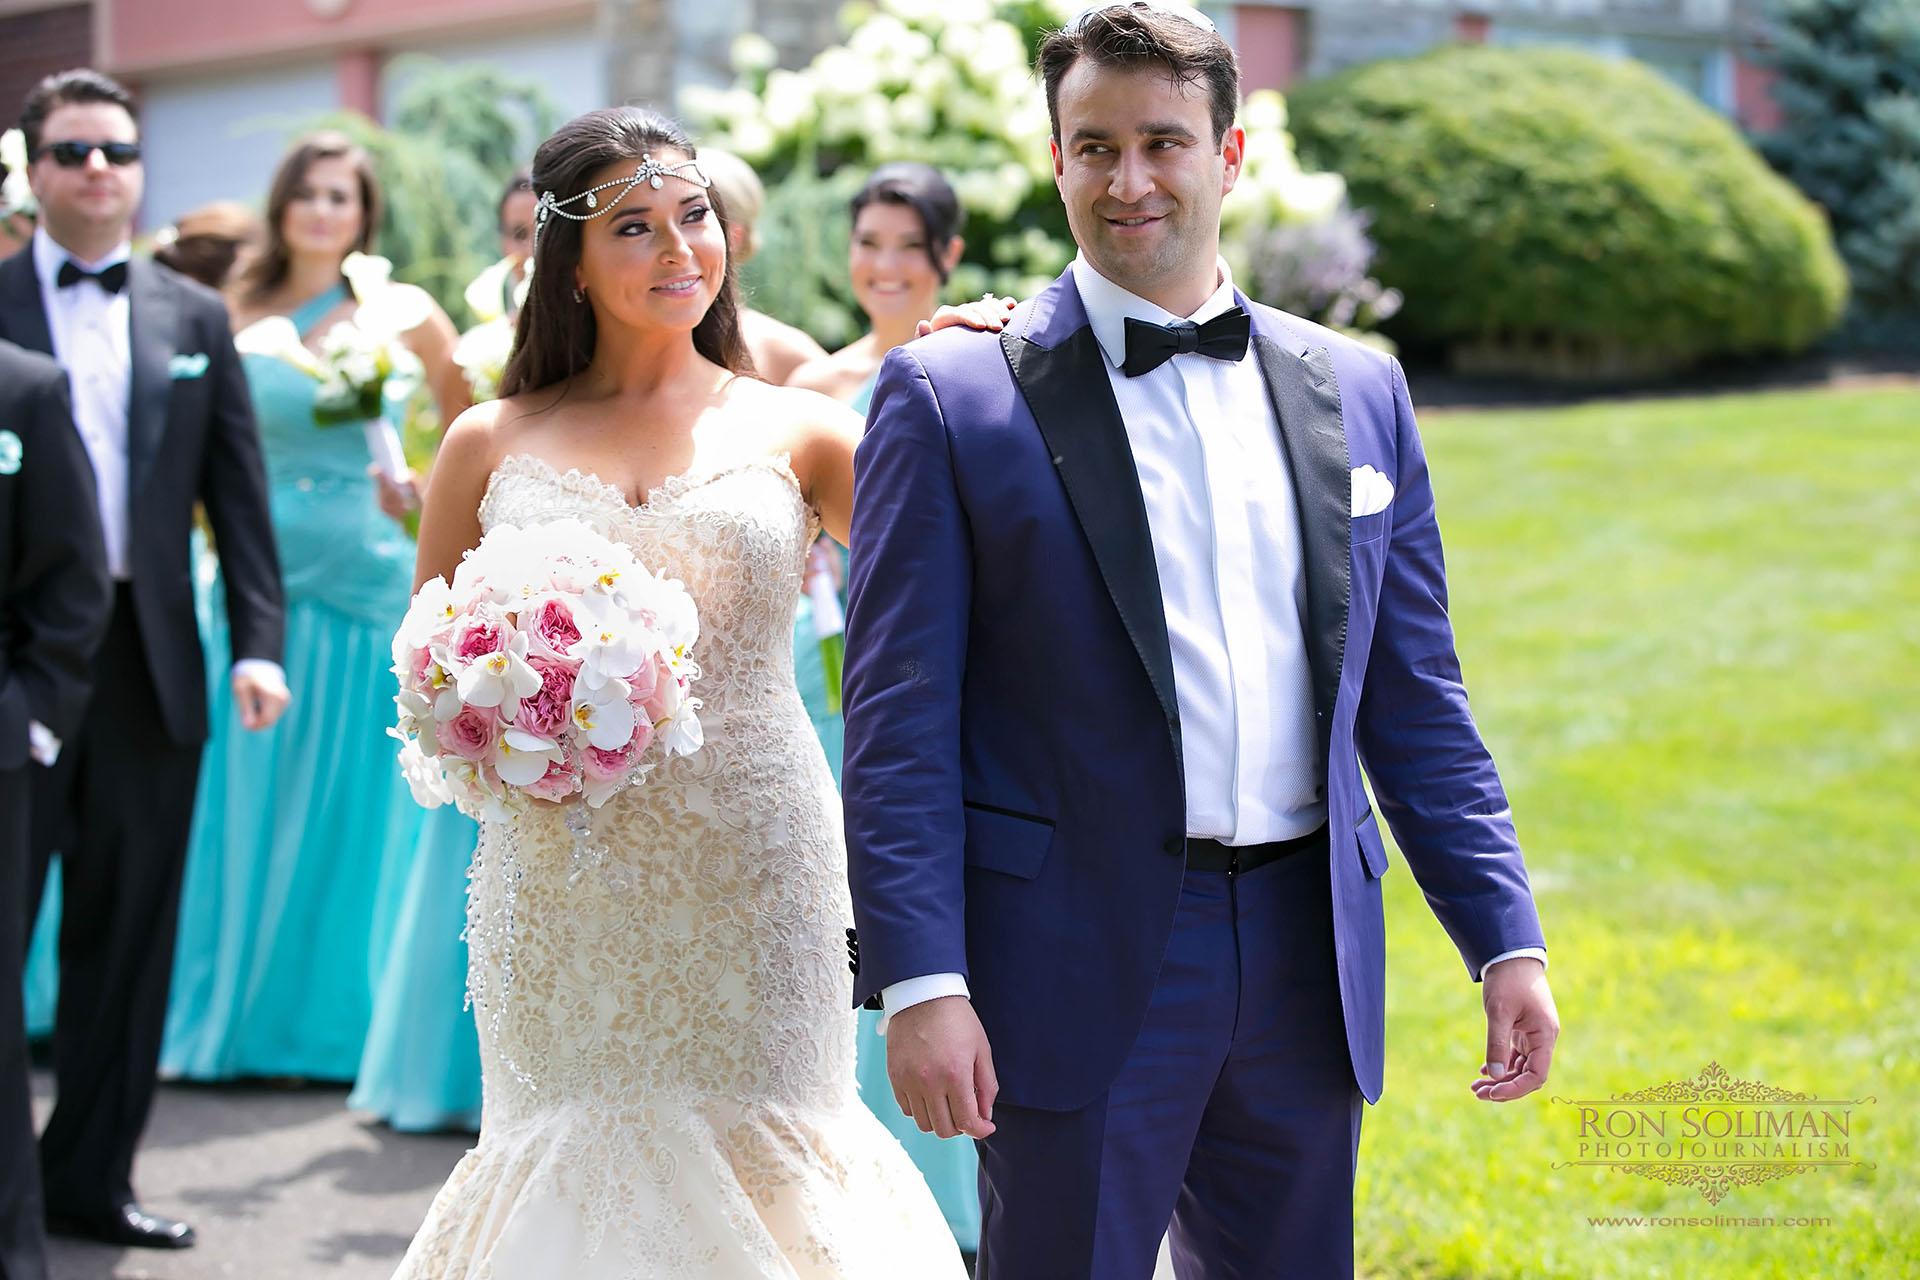 Romantic wedding first look